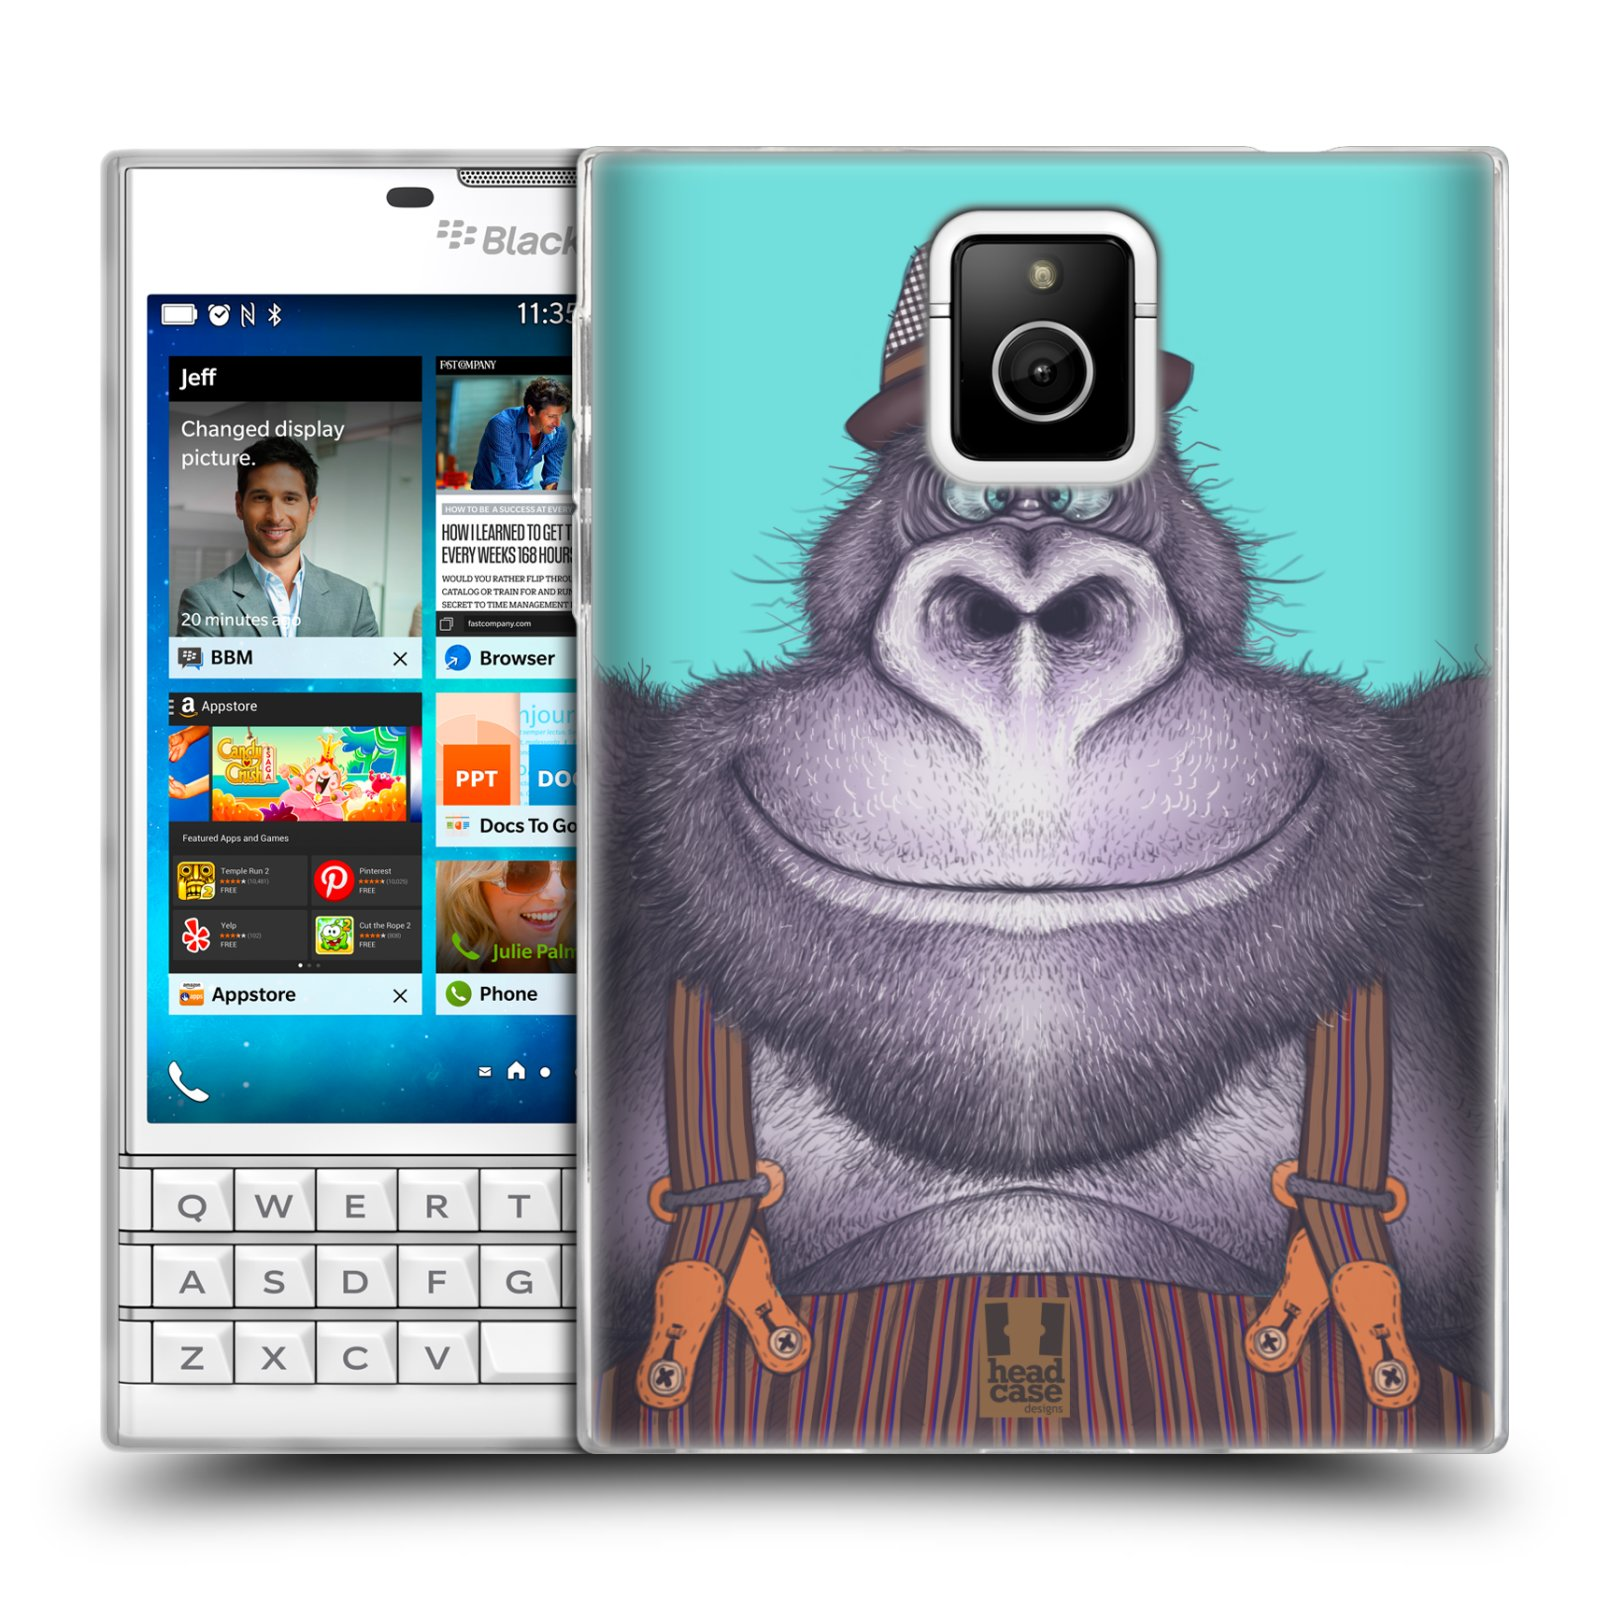 HEAD CASE silikonový obal na mobil Blackberry PASSPORT vzor Kreslená zvířátka gorila